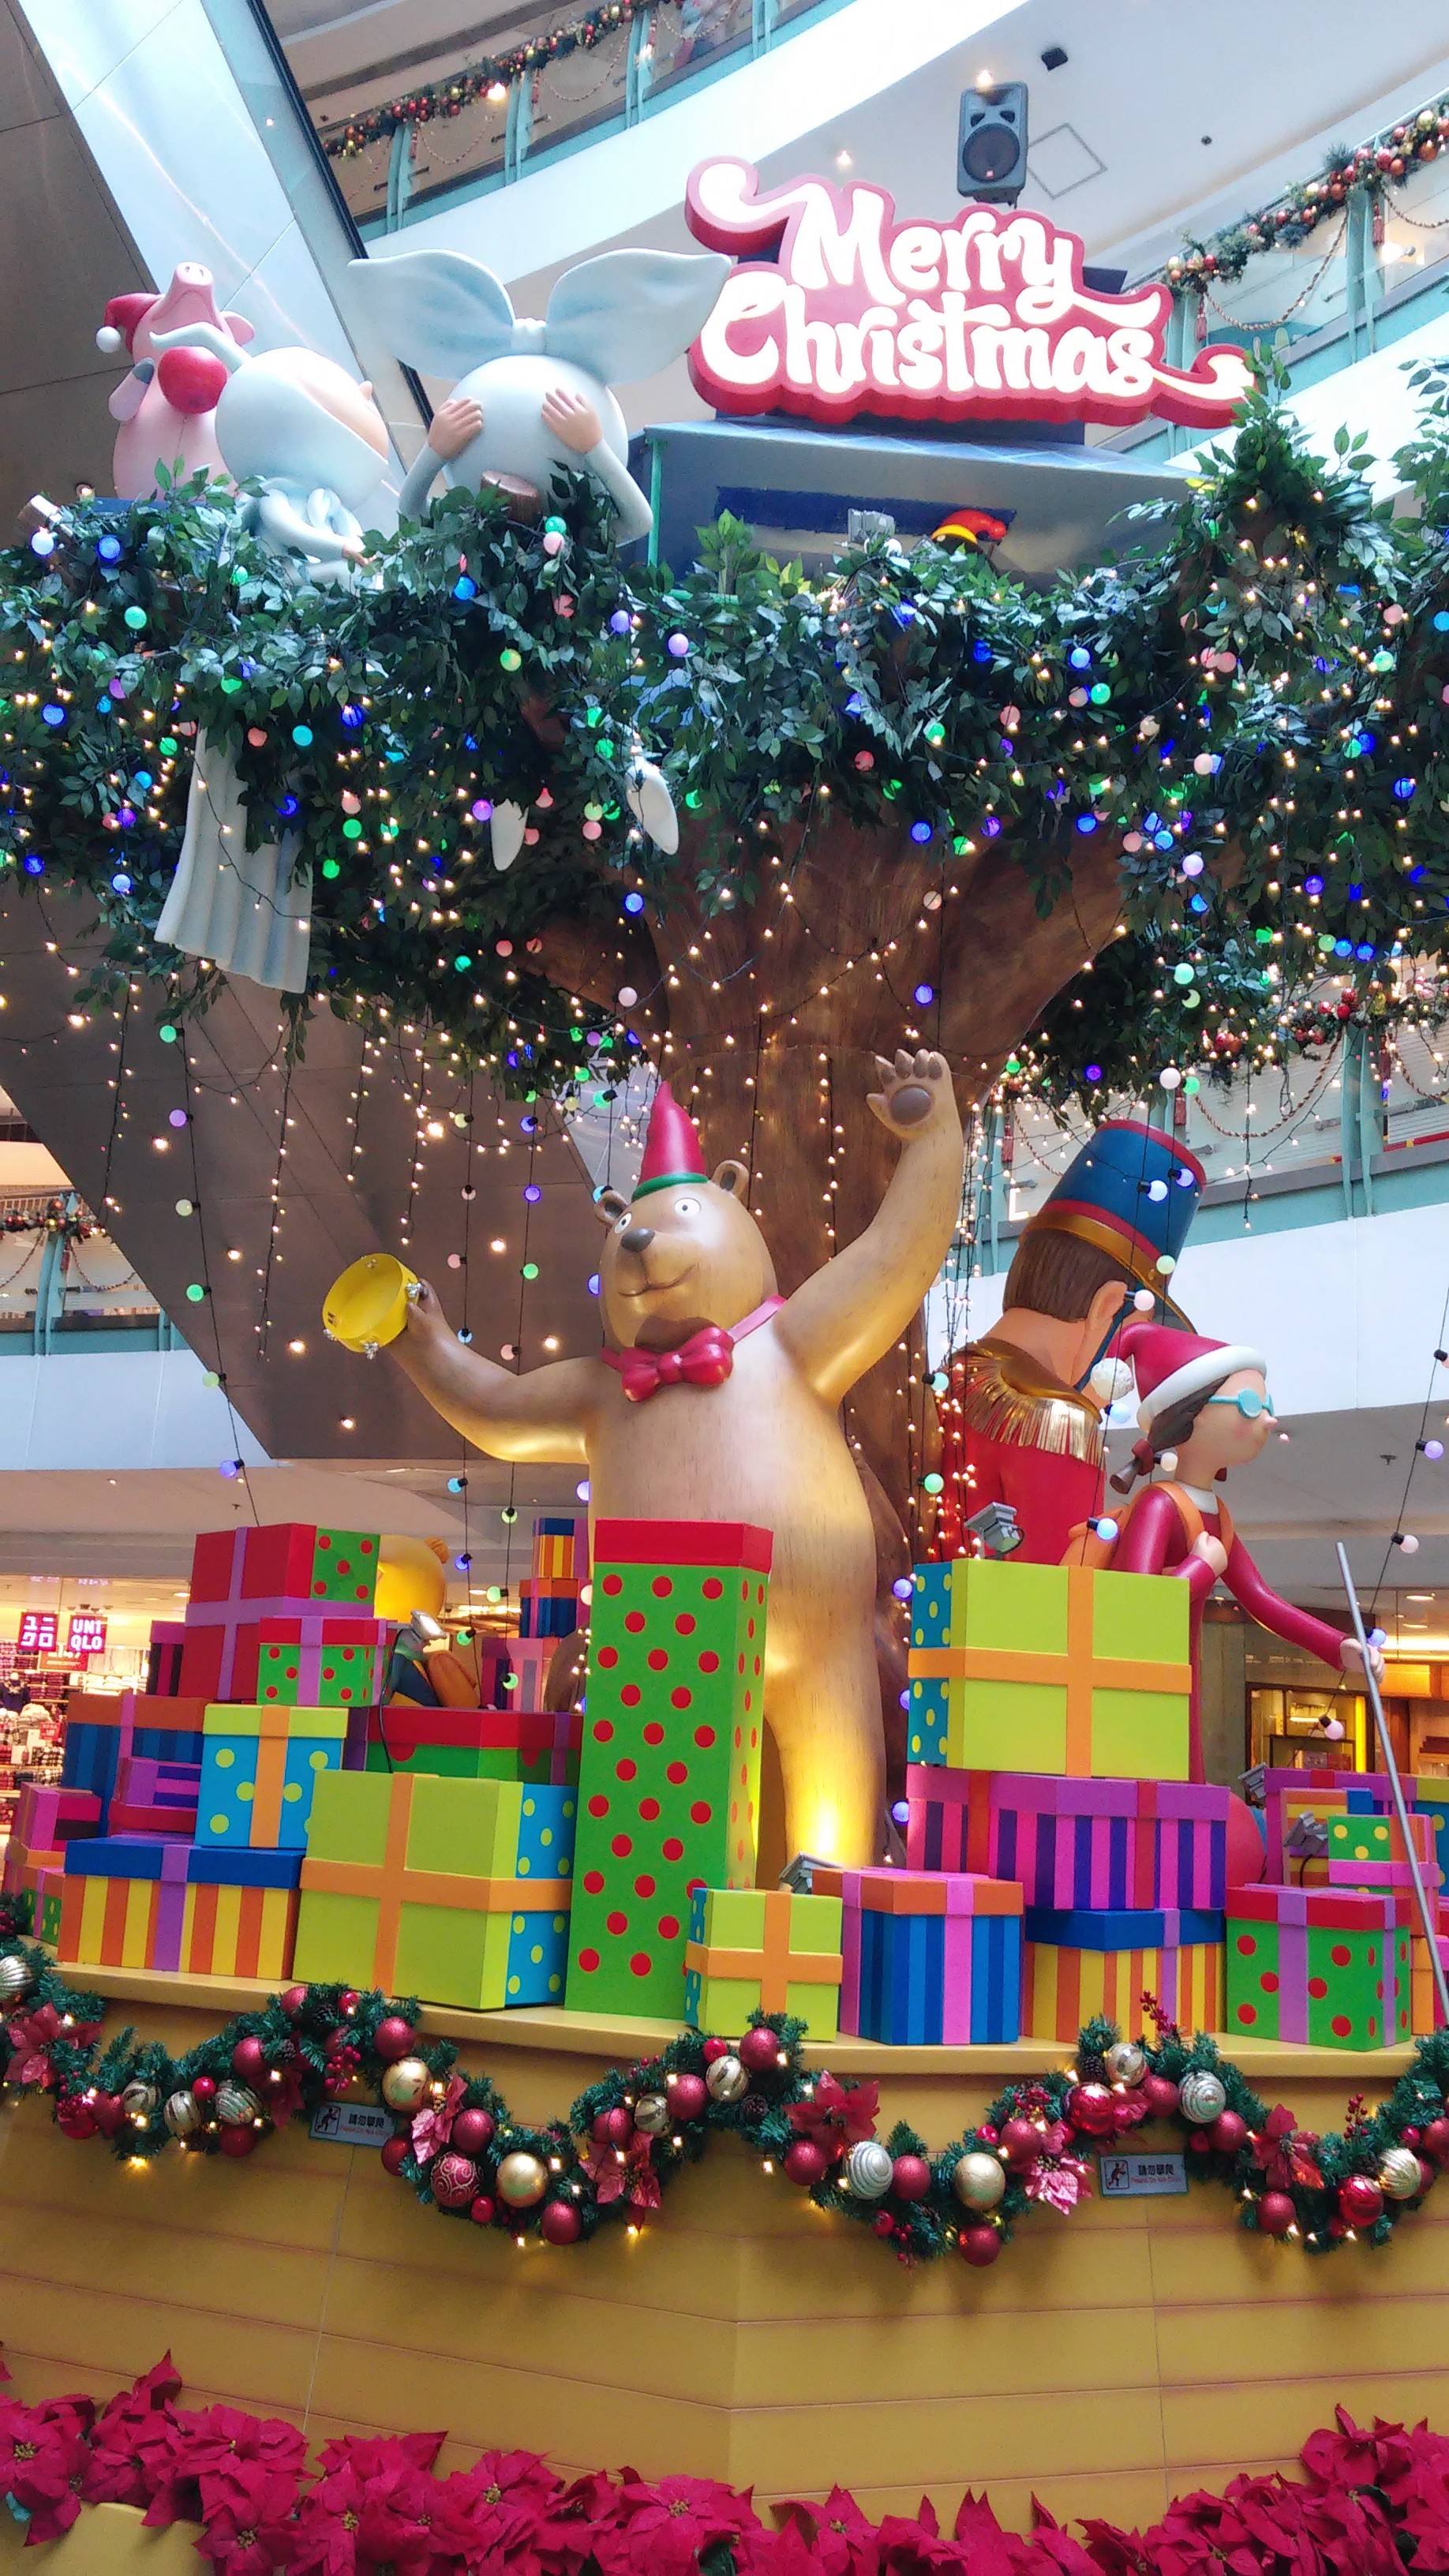 File:HK Kln Bay 德福廣場 Telford Plaza 2 interior decor tree Merry ...